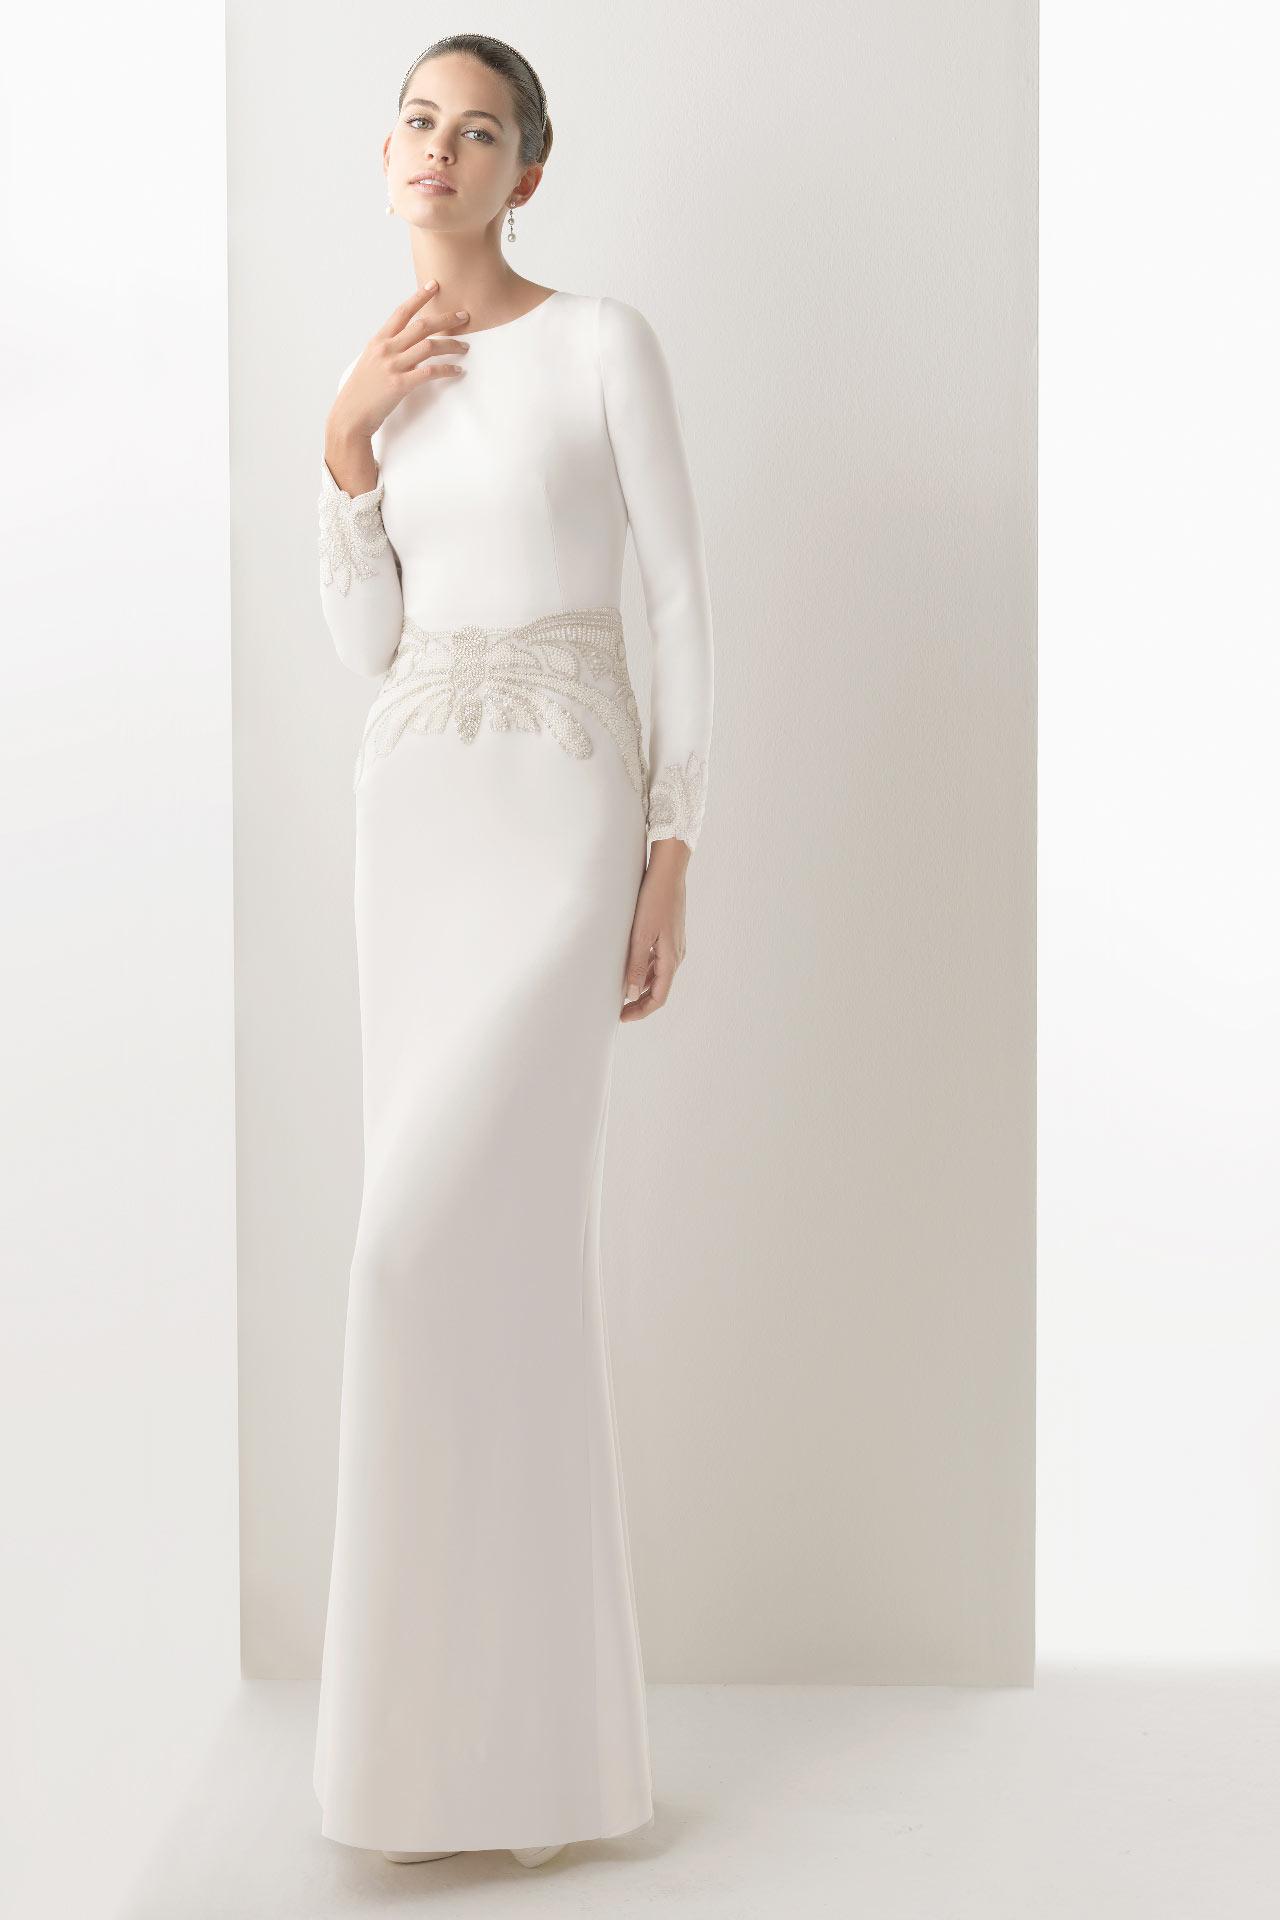 Robe de soiree pour mariage civil